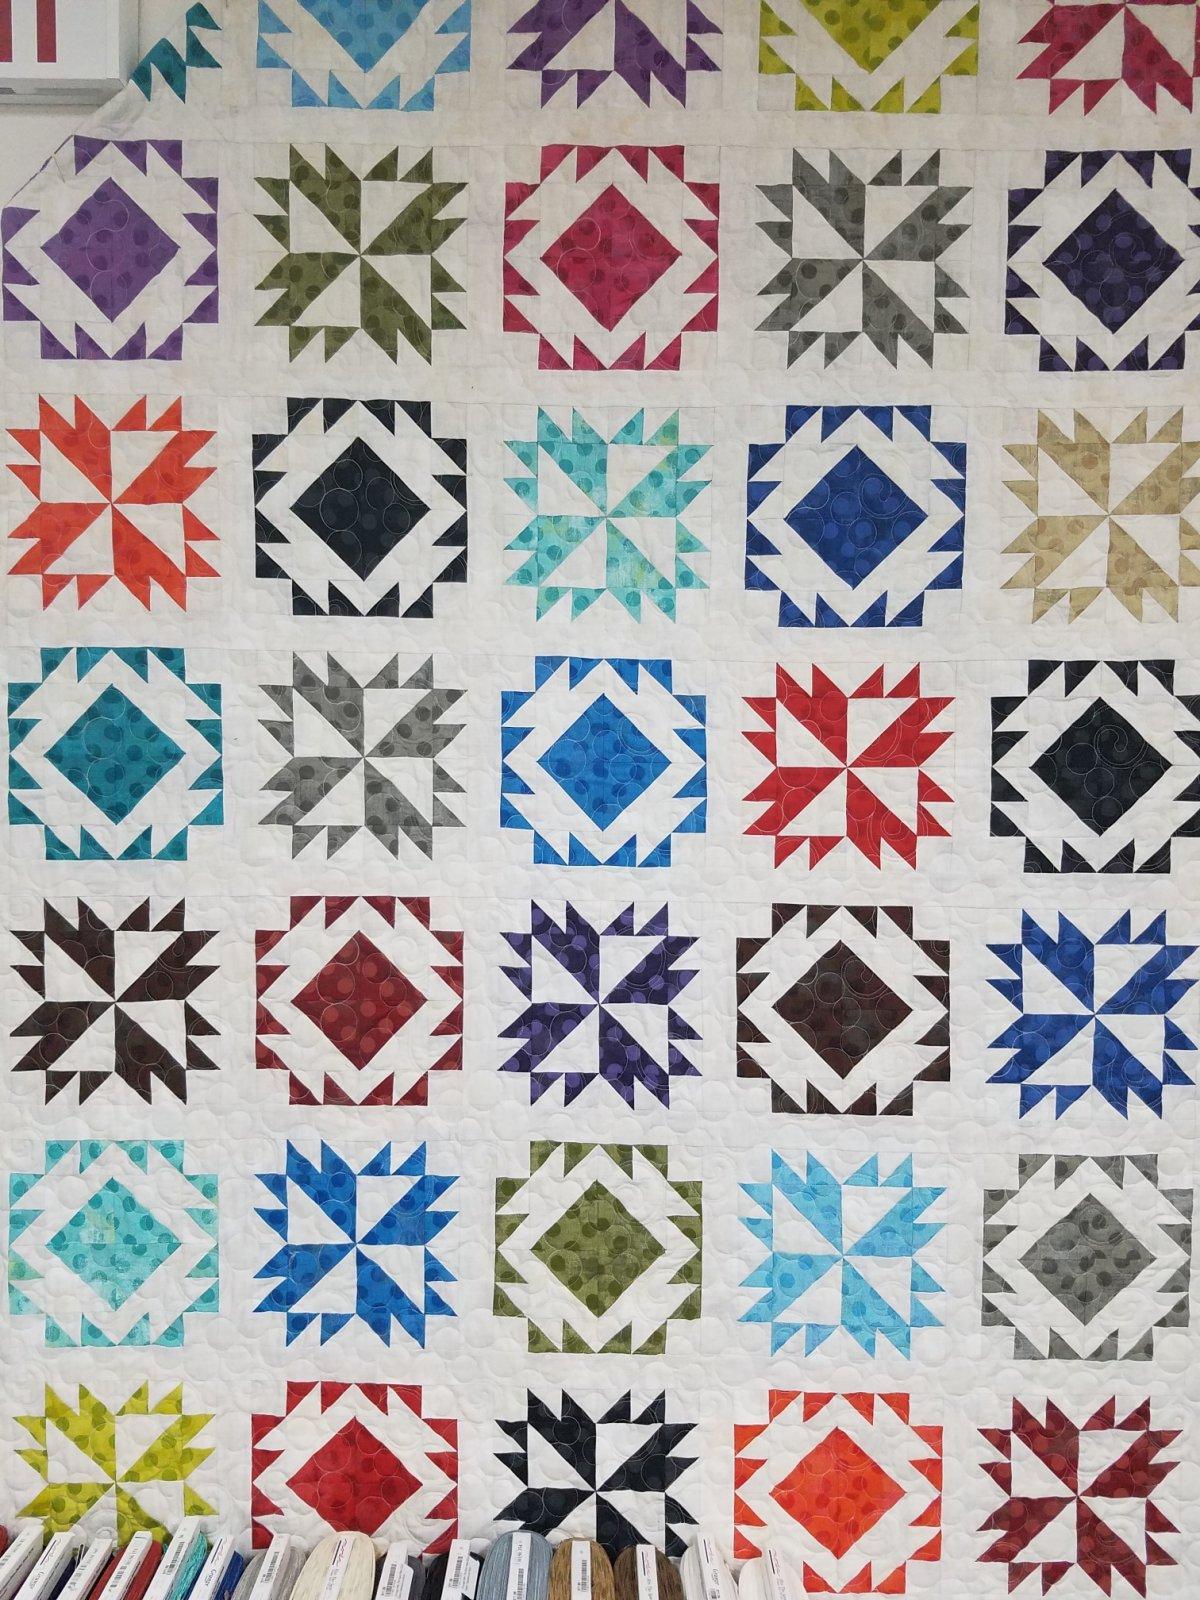 Tiramisu Quilt Kit featuring Moda Grunge Dots